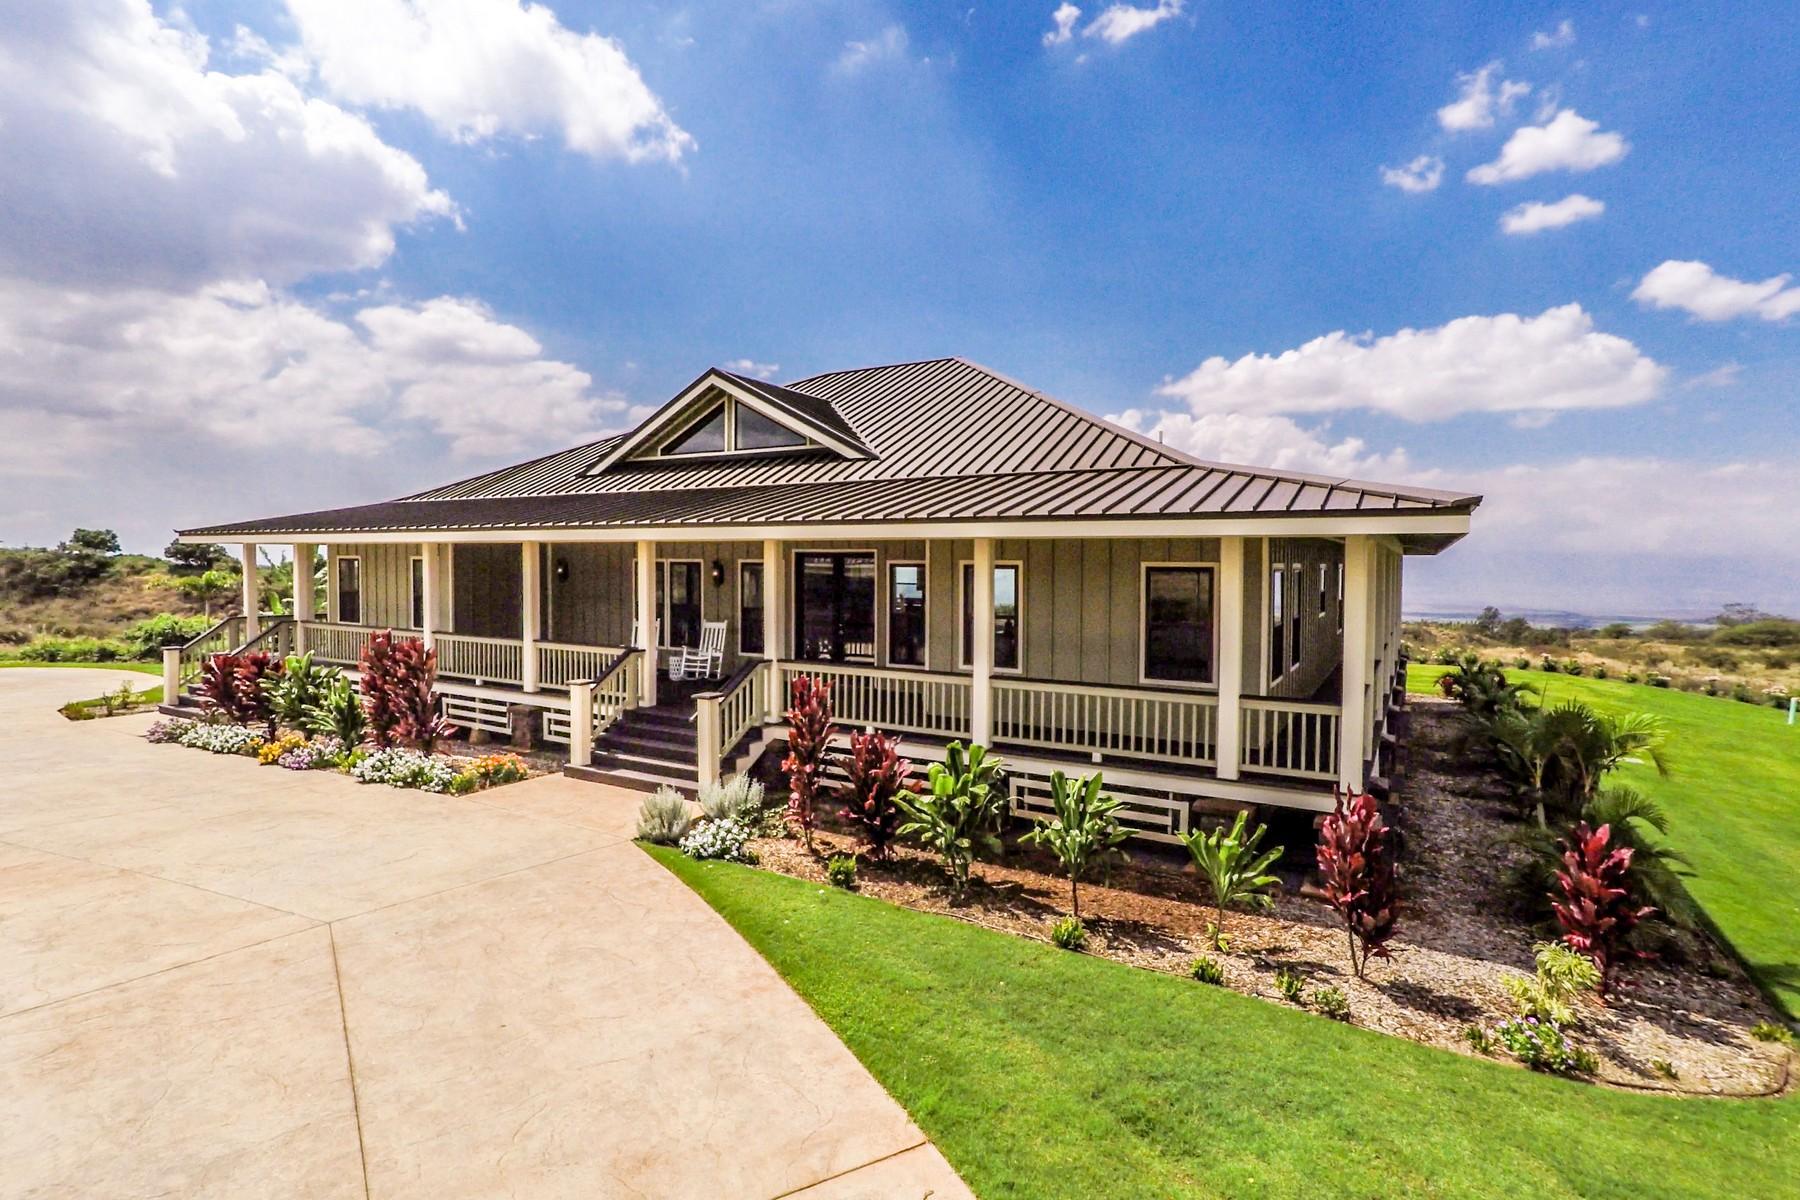 Villa per Vendita alle ore Luxury Plantation Kula Living 148 Hoomaikai Place, Lot 3 Kula, Hawaii, 96790 Stati Uniti